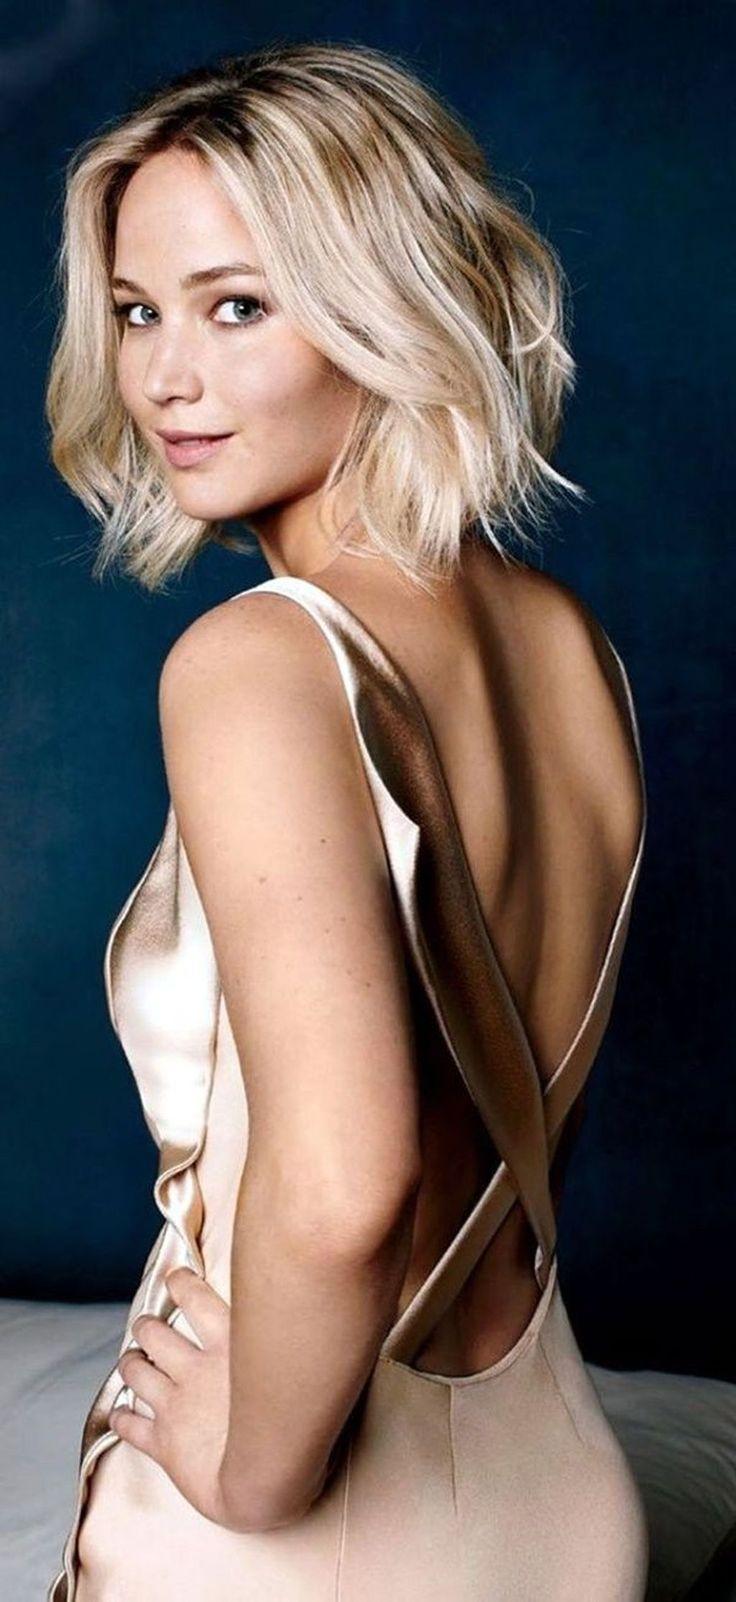 nice 62 Awesome Women Short Hair 2017 Trends Ideas  http://lovellywedding.com/2017/12/23/62-awesome-women-short-hair-2017-trends-ideas/